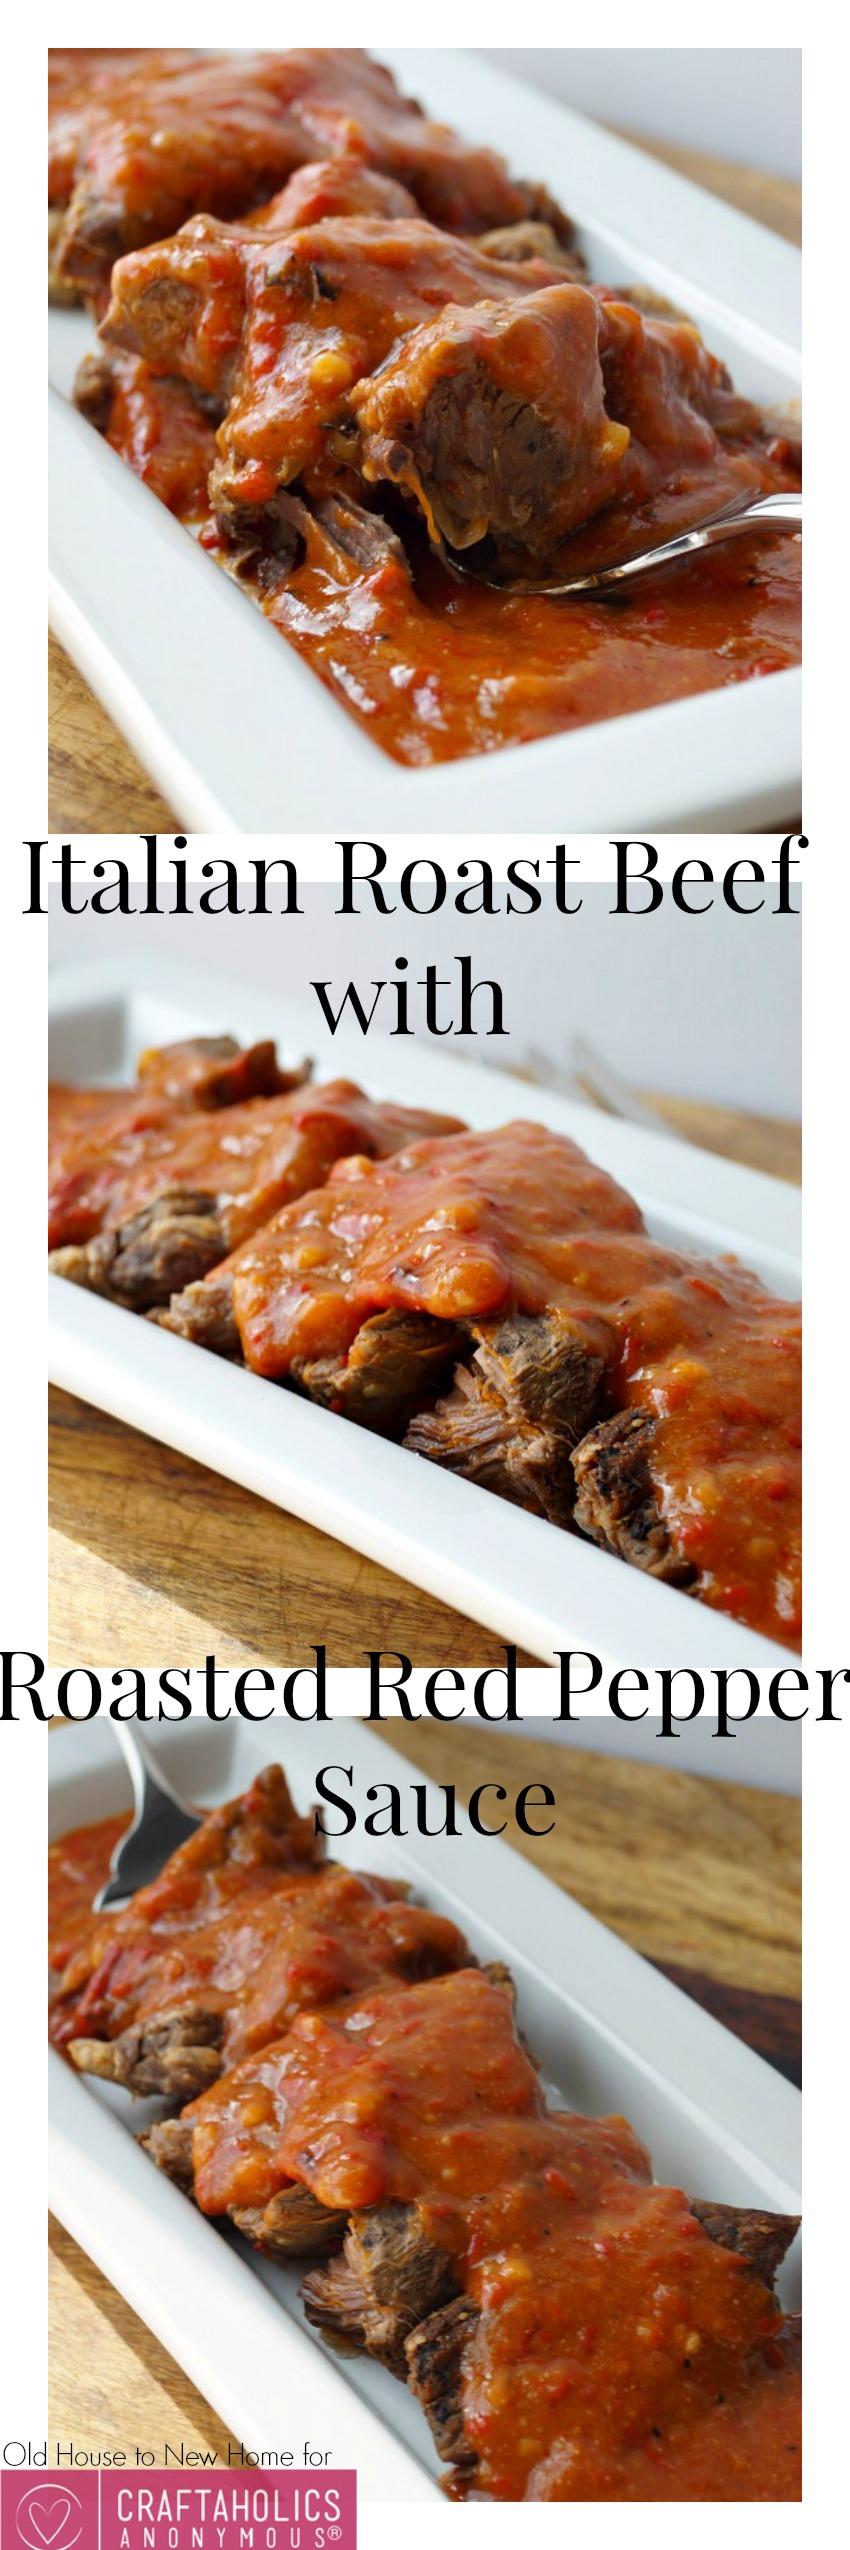 Italian Roast Beef with Roasted Red Pepper Sauce || BEST roast beef recipe ever!